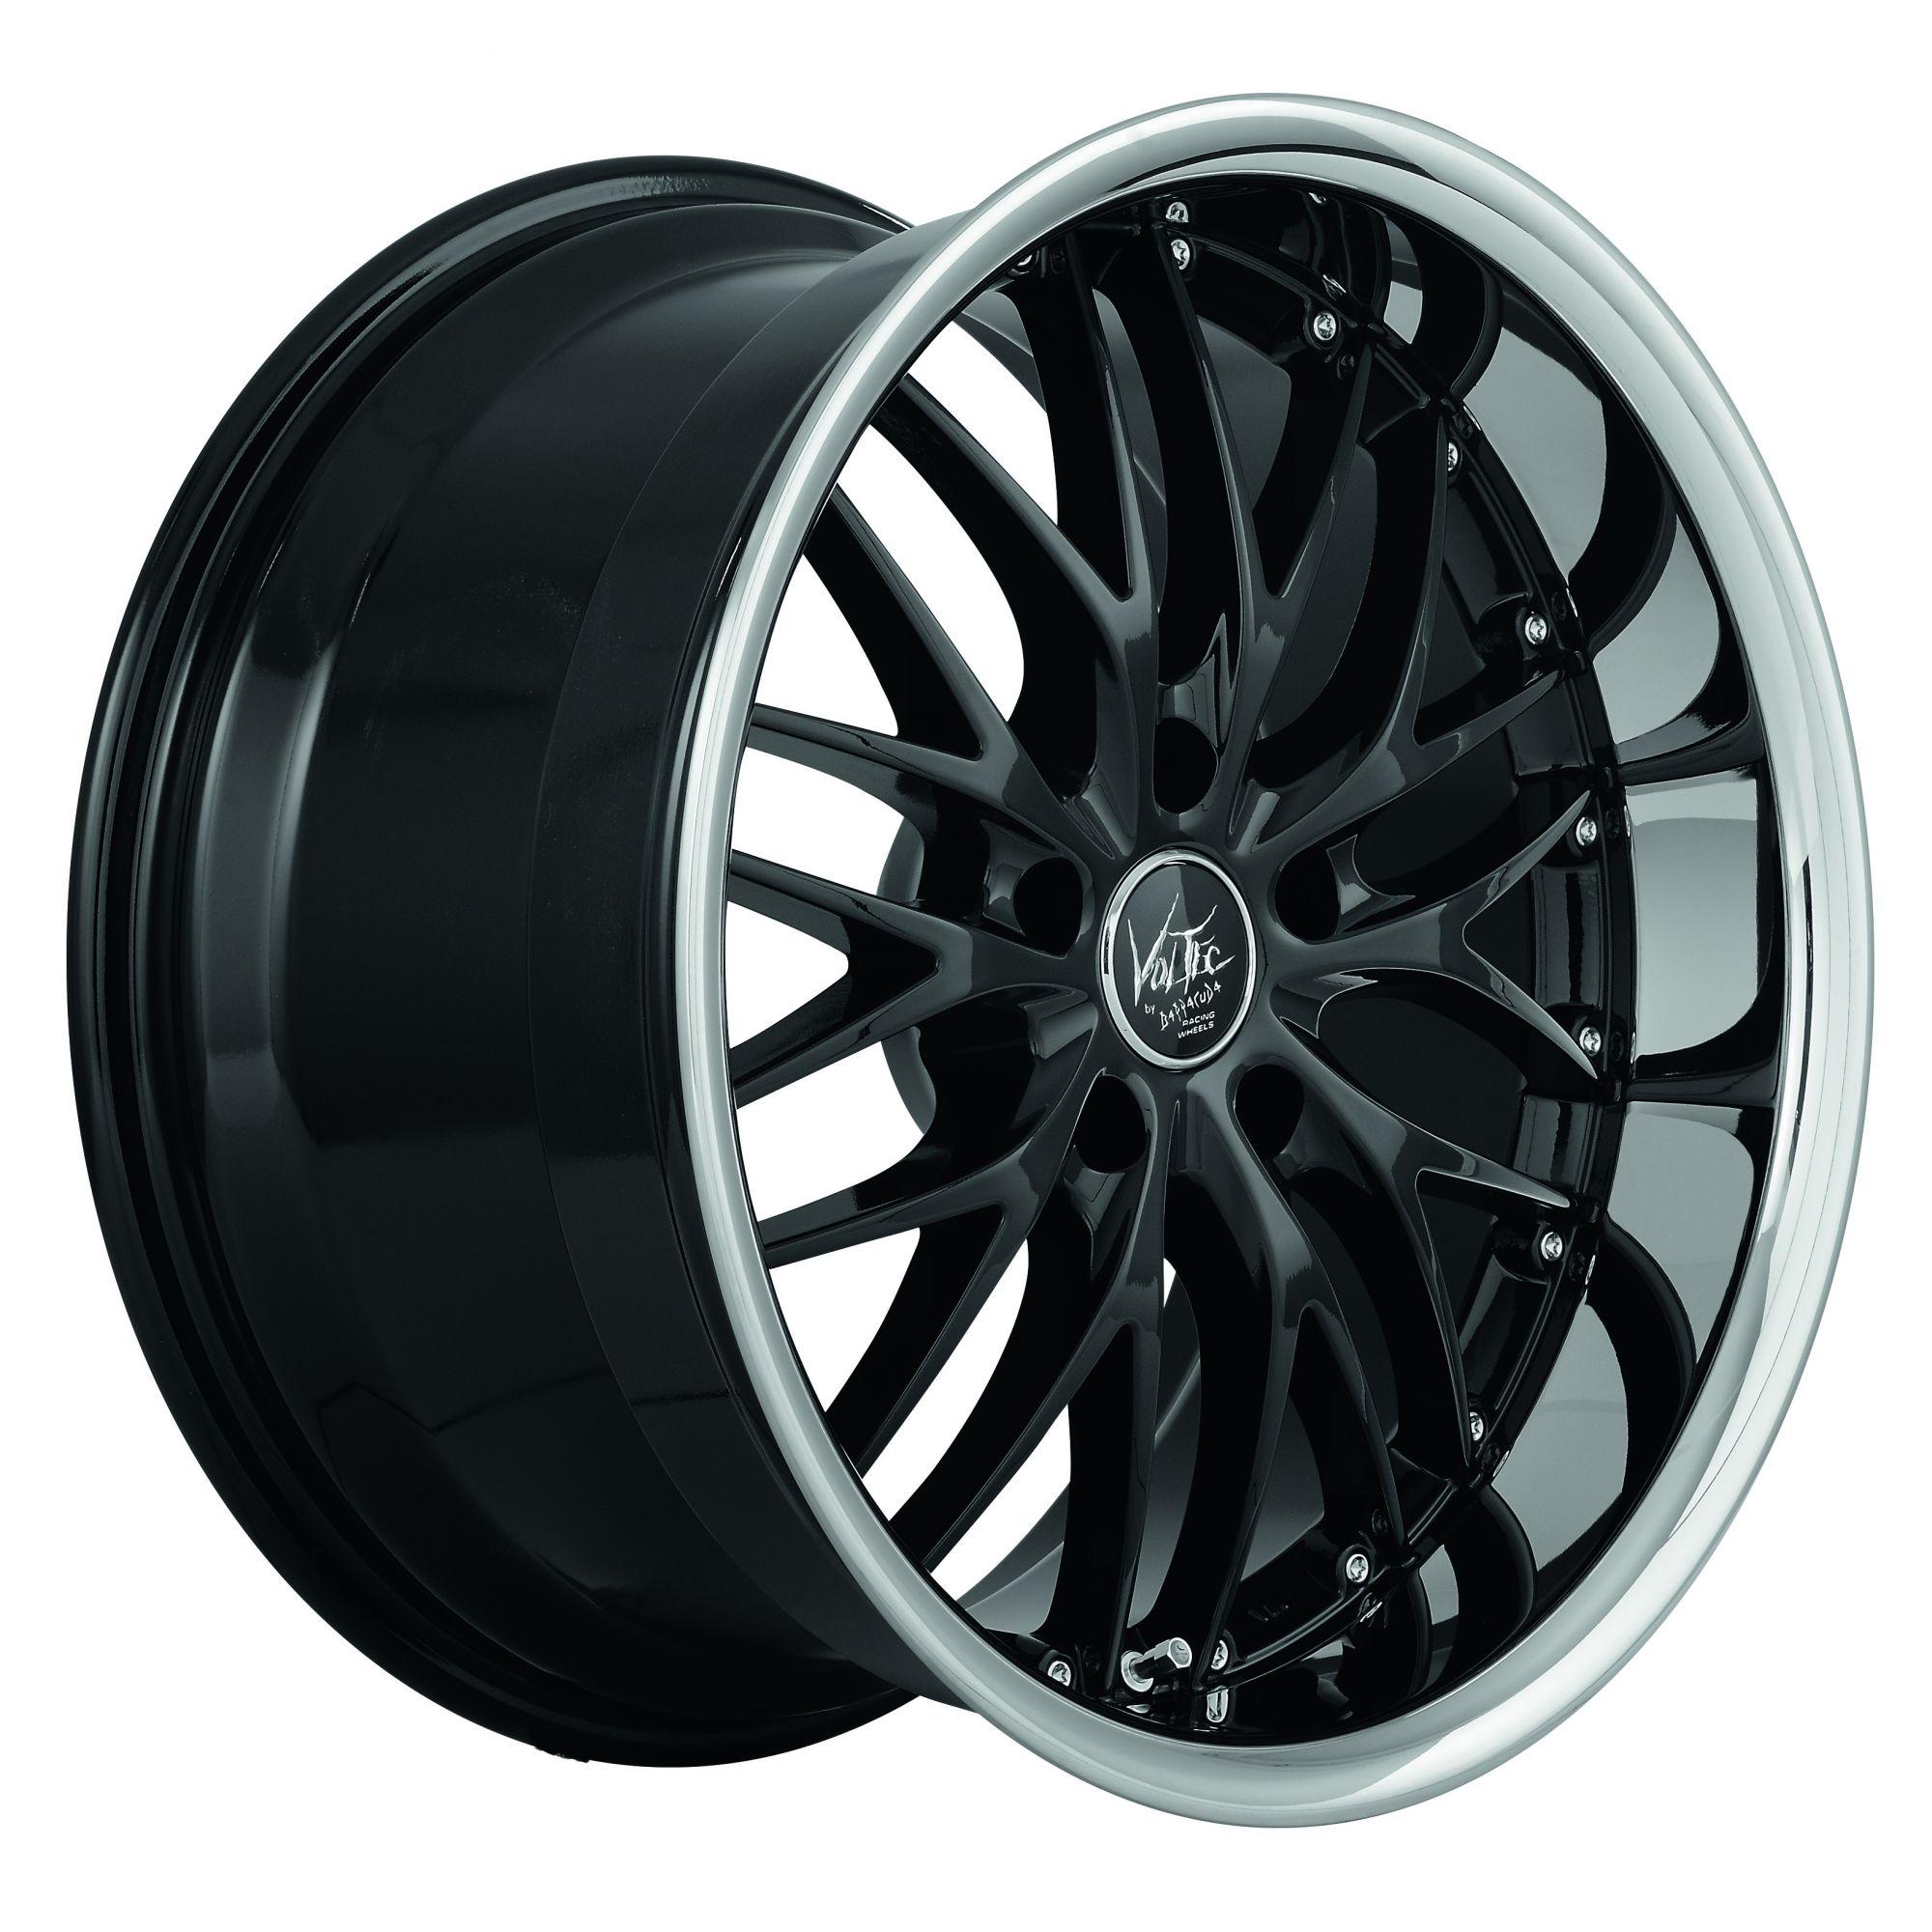 barracuda voltec t6 suv trackspacer felgen highgloss black. Black Bedroom Furniture Sets. Home Design Ideas